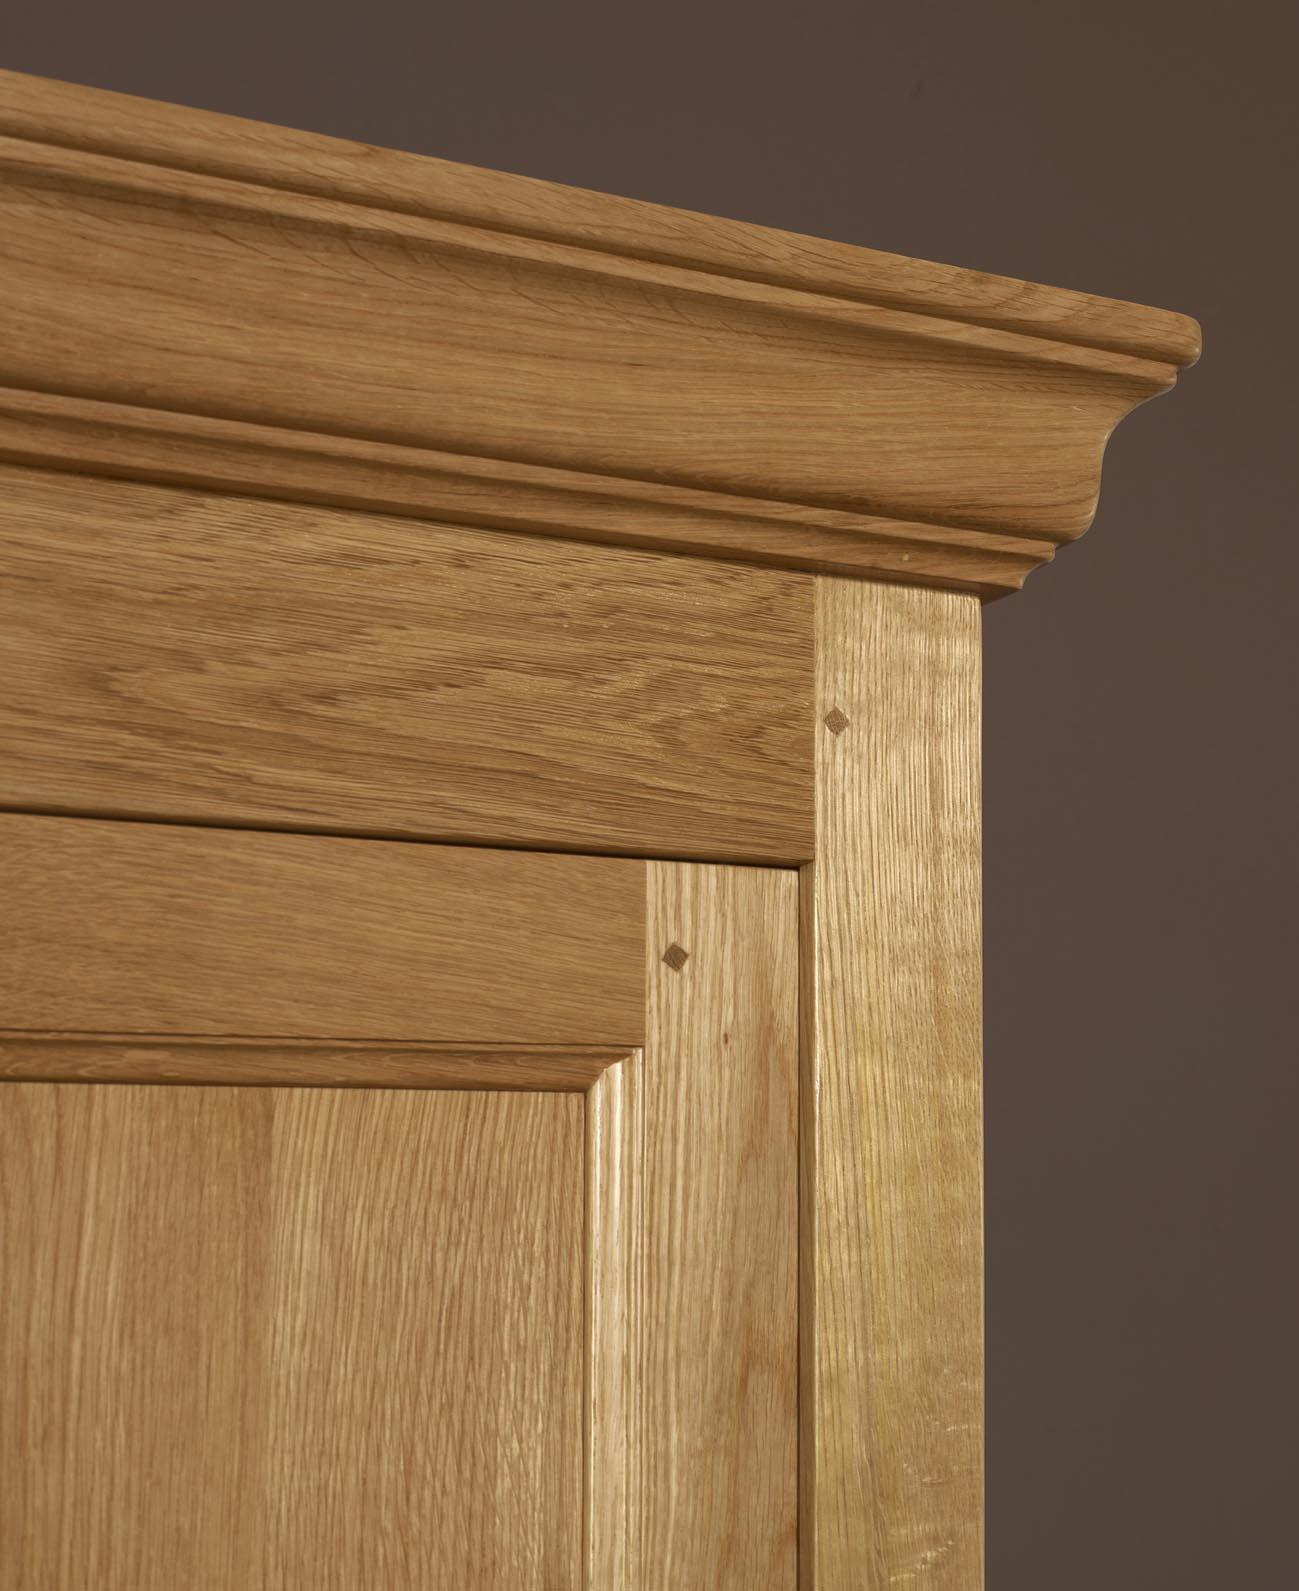 armoire 2 portes en ch ne massif de style campagnard meuble en ch ne. Black Bedroom Furniture Sets. Home Design Ideas